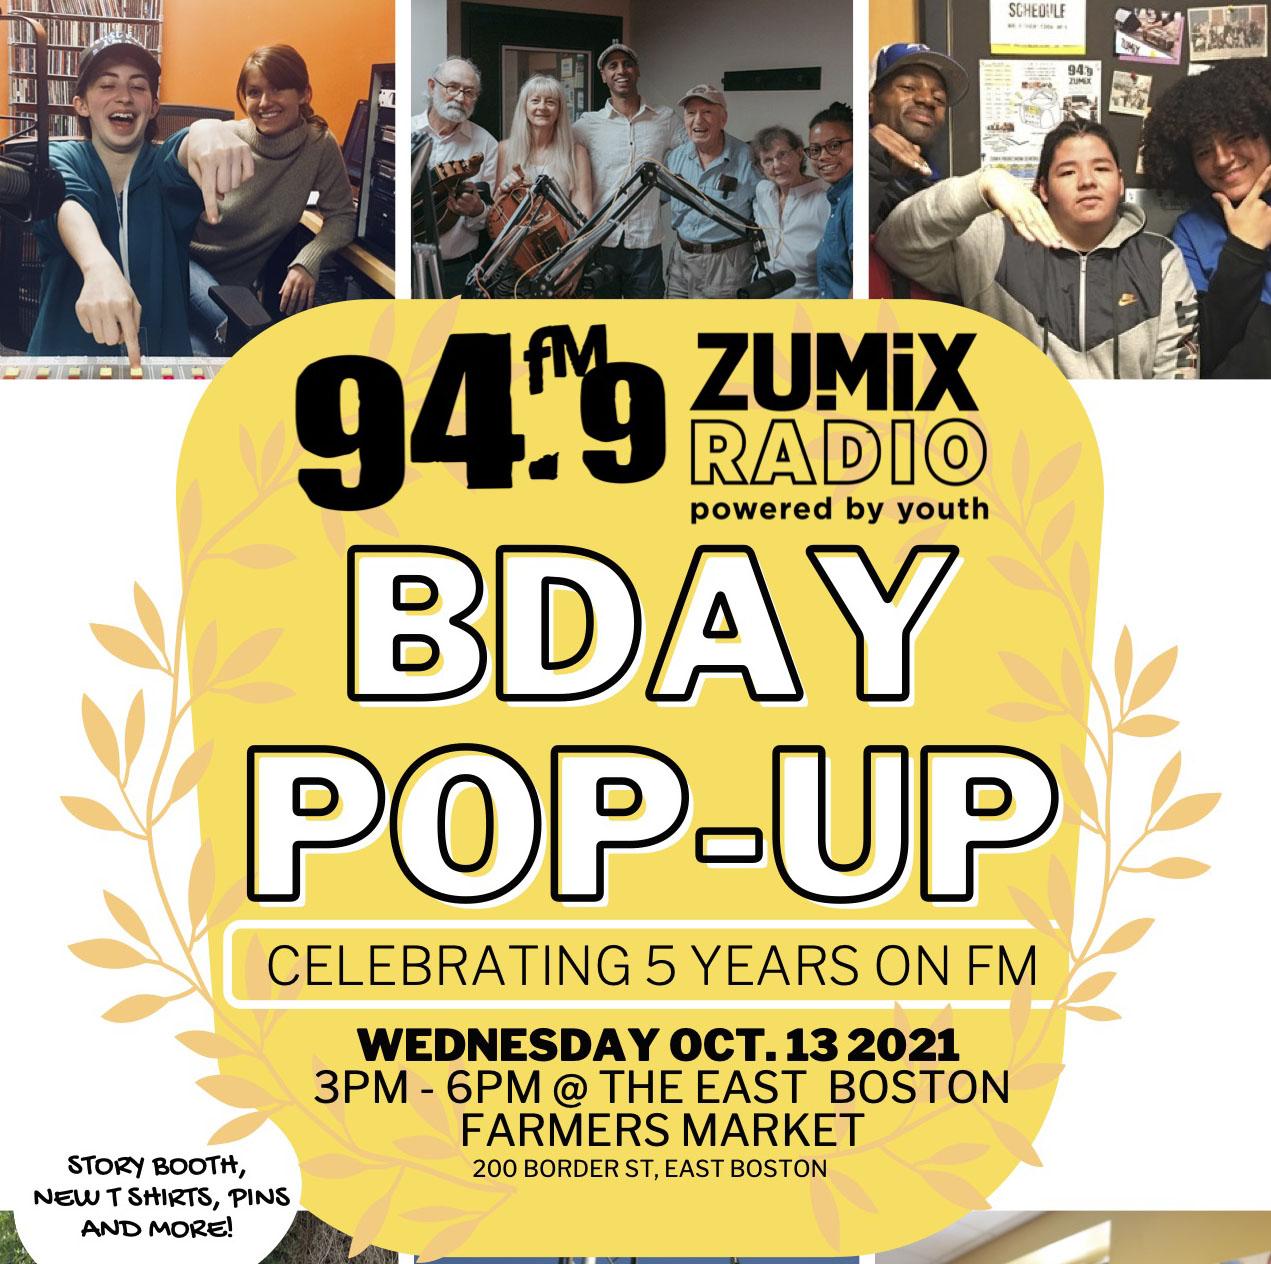 ZUMIX Radio celebrates 5 Years on the air